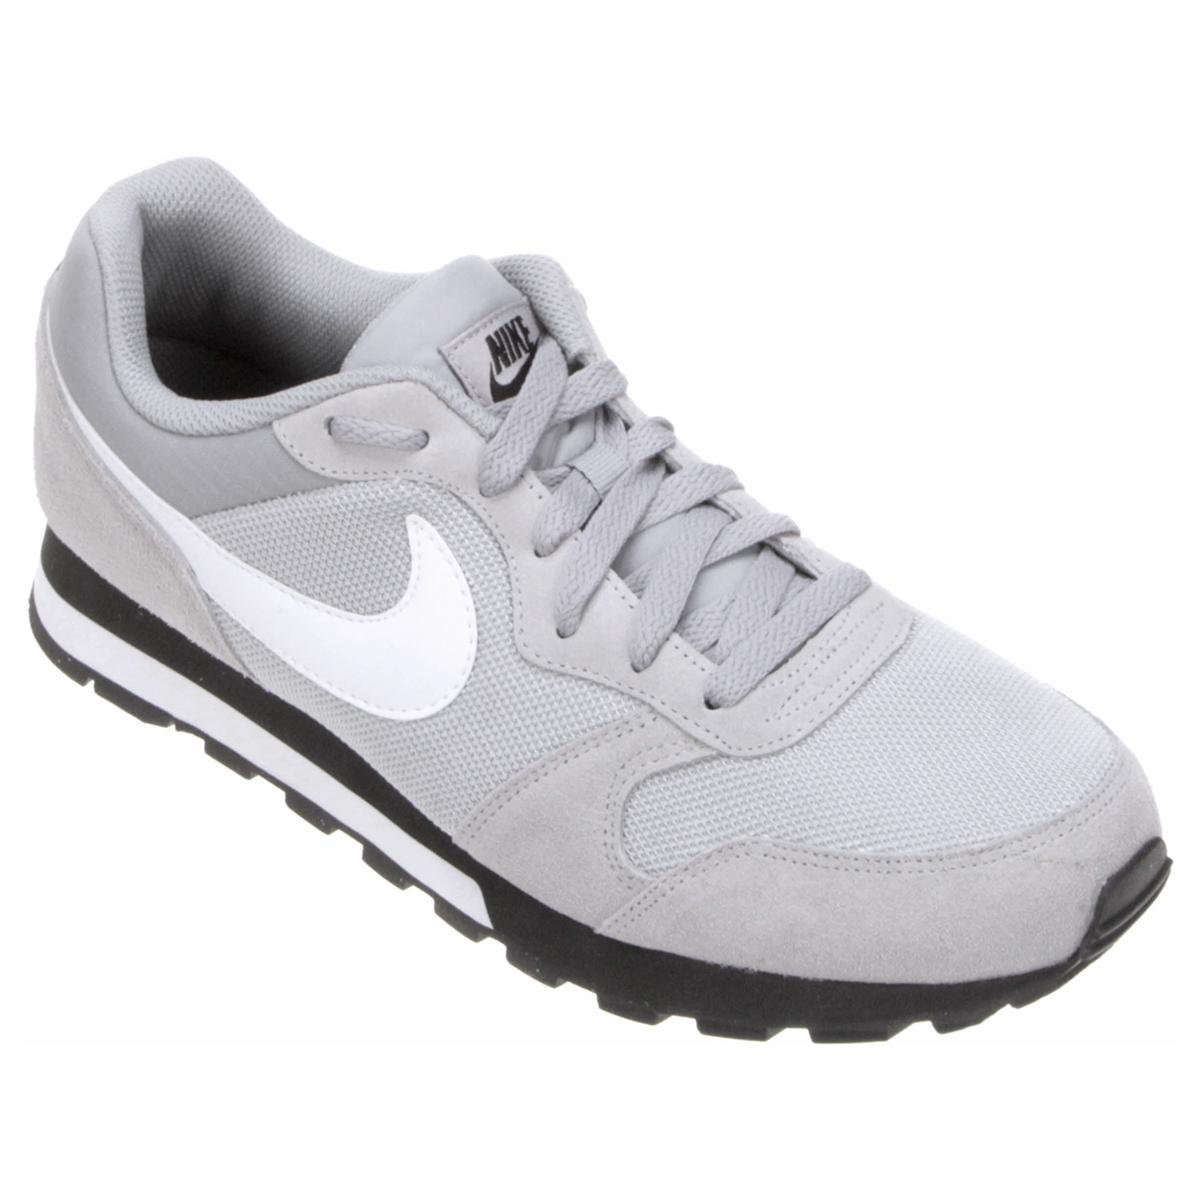 e8472a9293087 Tênis Nike Md Runner 2 Masculino - Cinza e Branco - Compre Agora ...